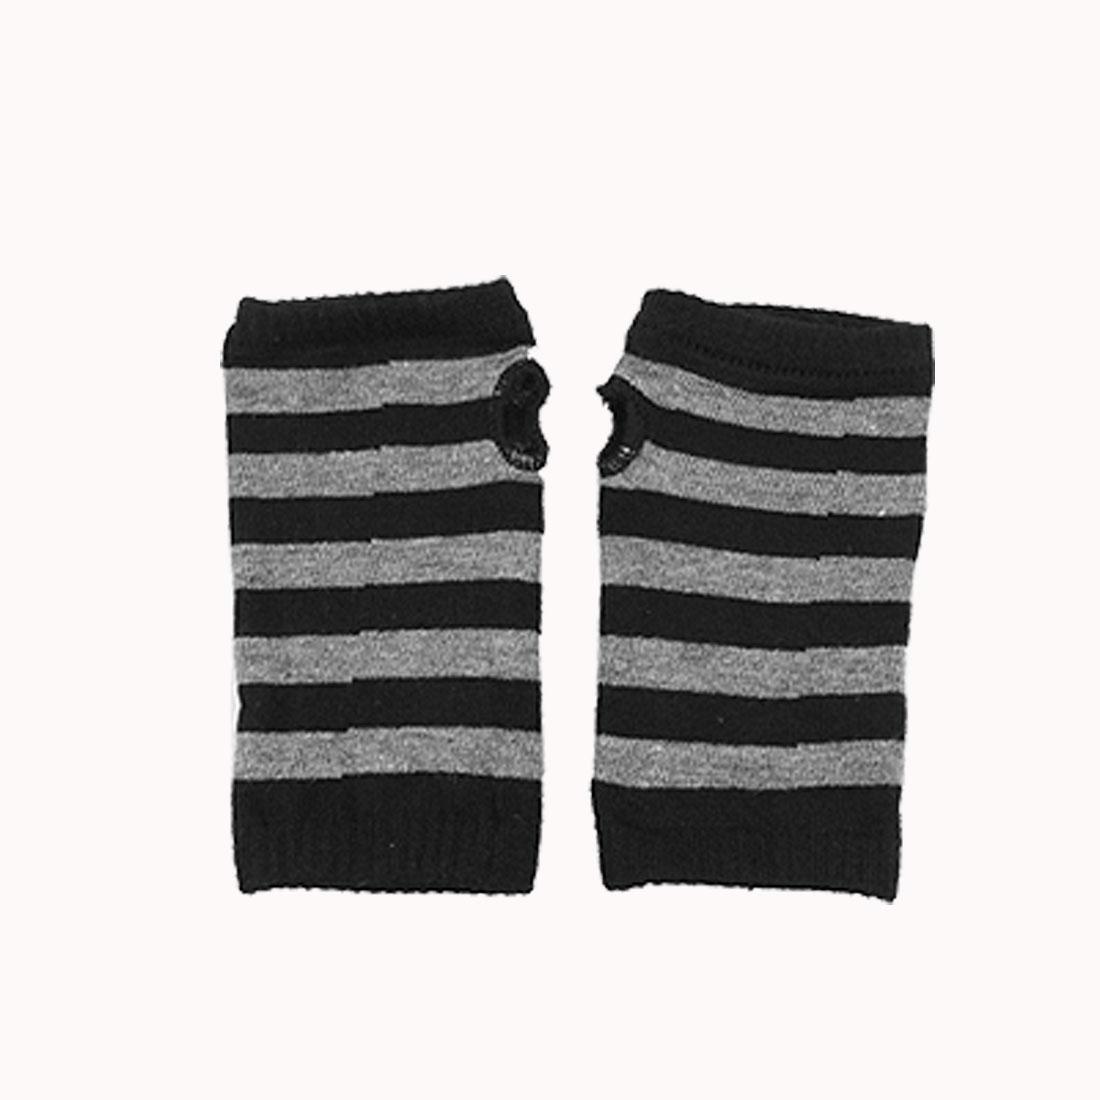 Pair Black Gray Striped Mitten Warm Fingerless Gloves for Ladies